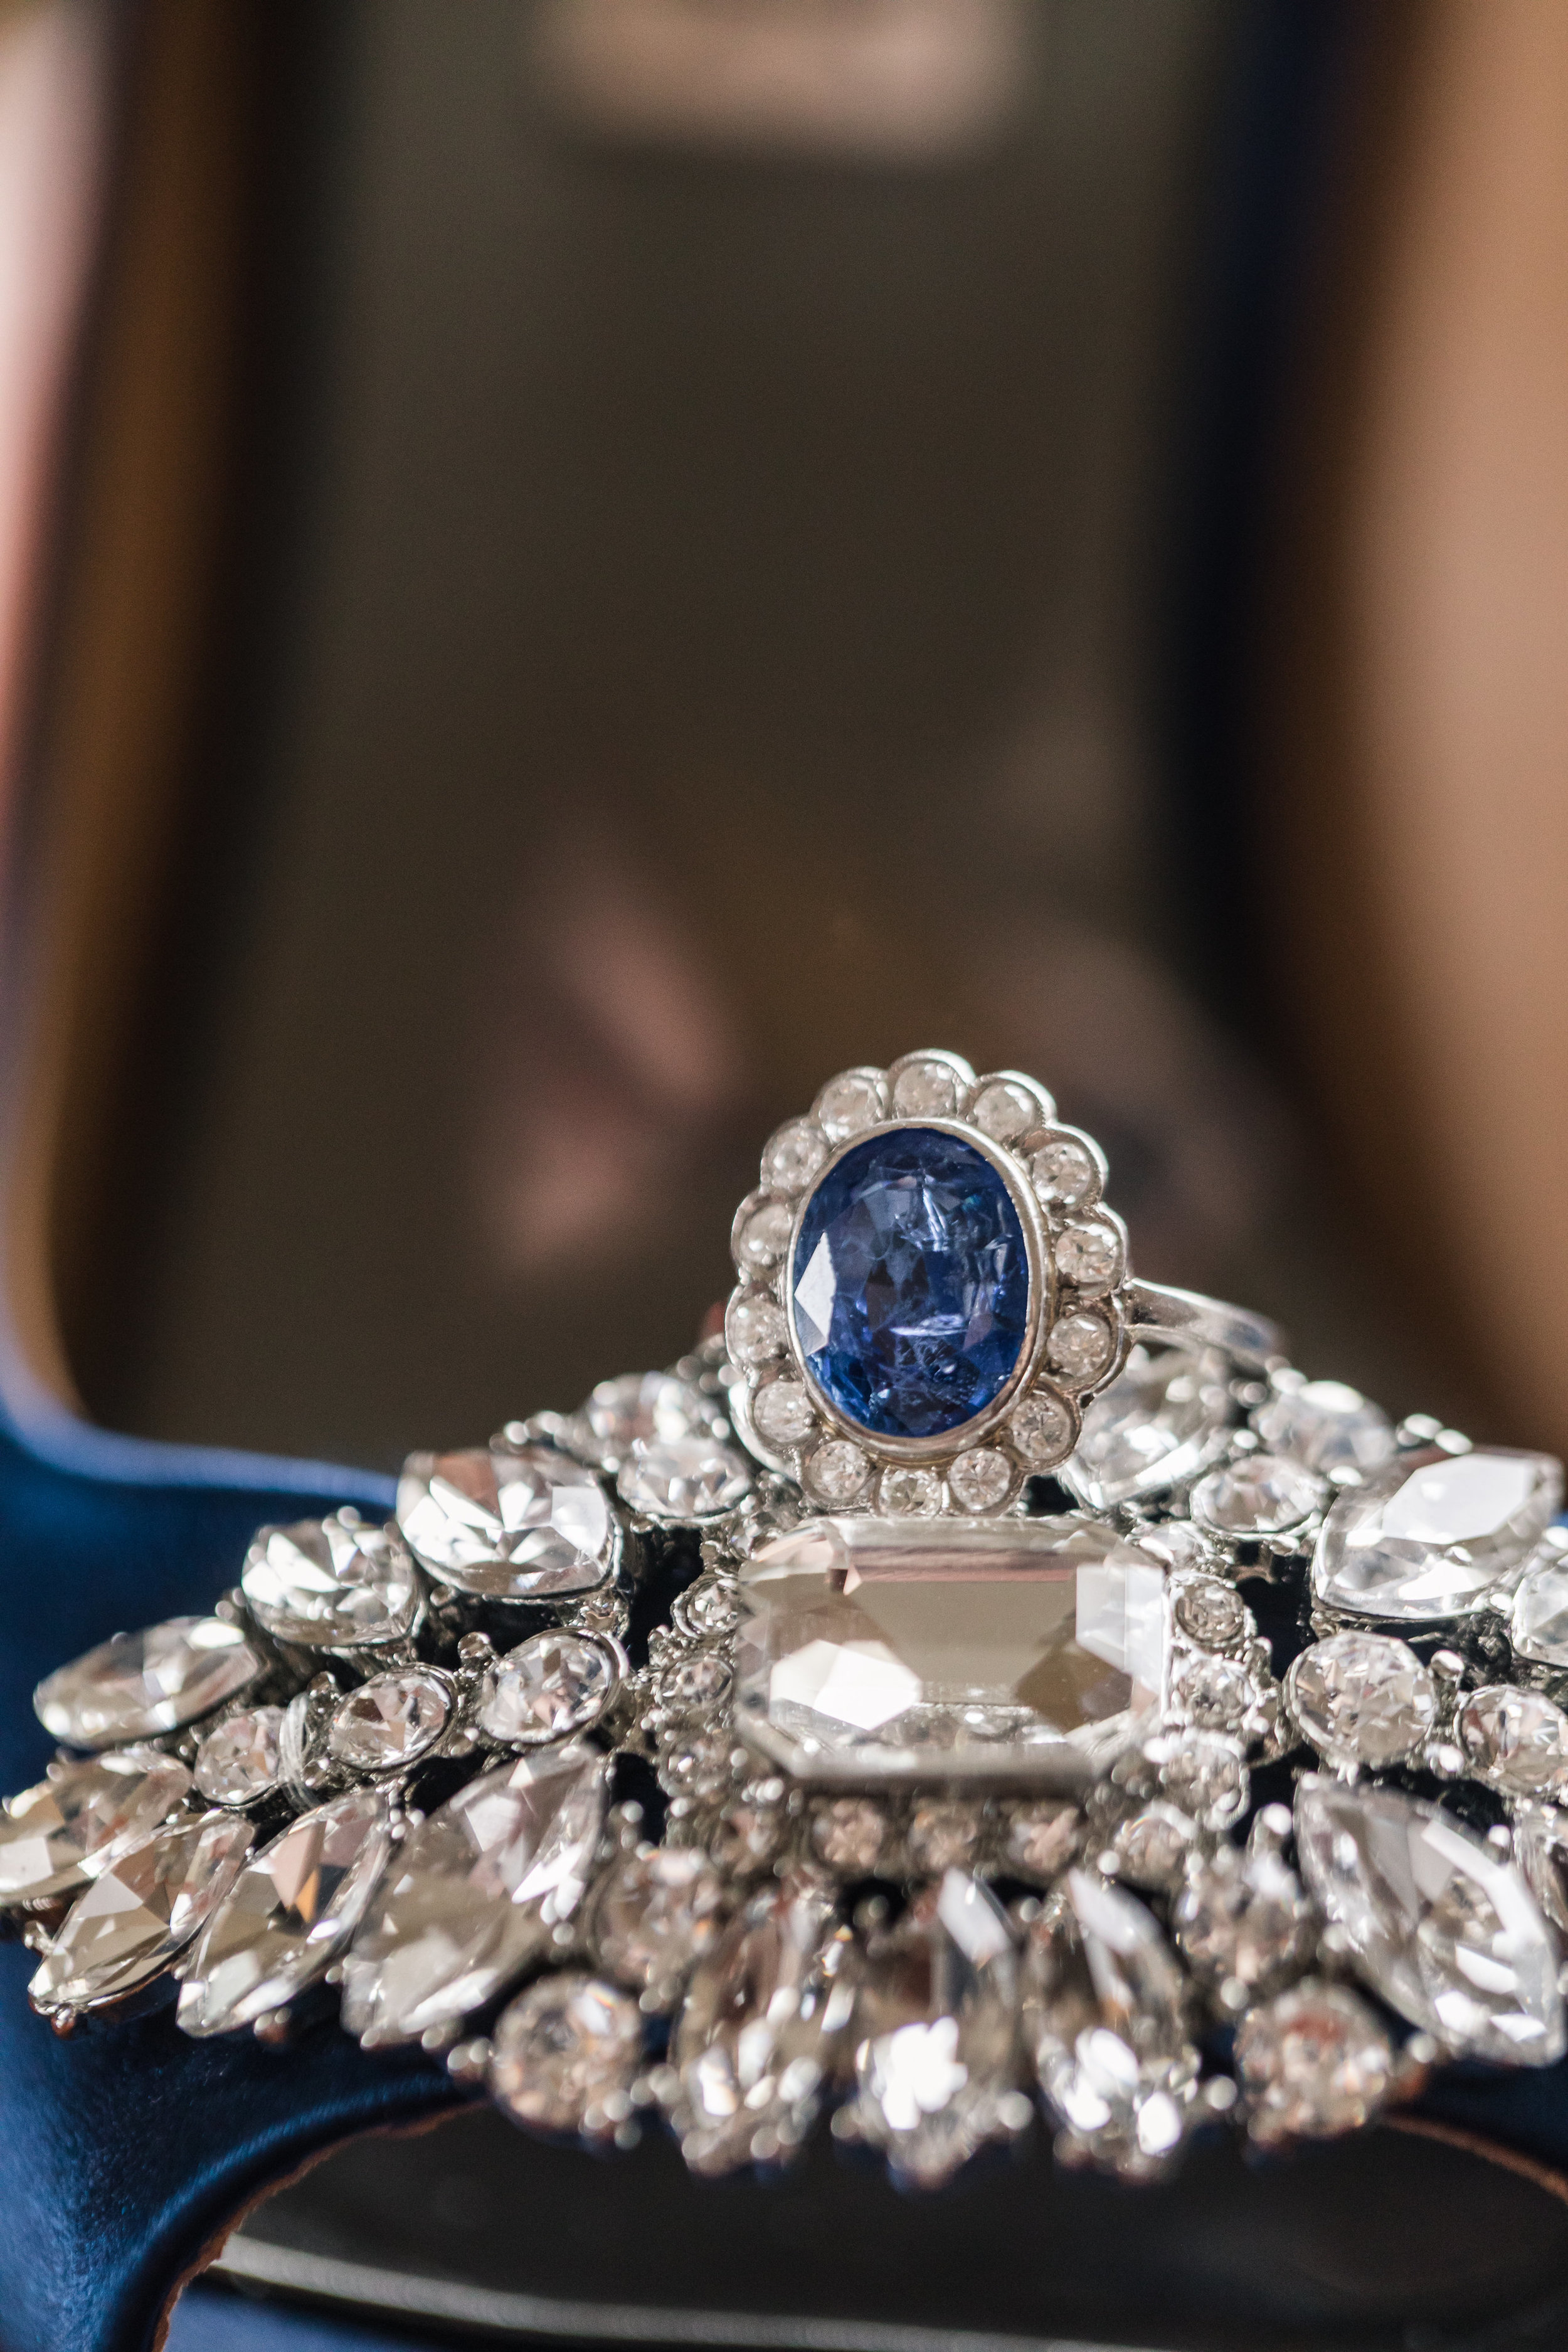 Blue Halo Engagement Ring - A Classic George Washington Hotel Wedding - Photography by Marirosa